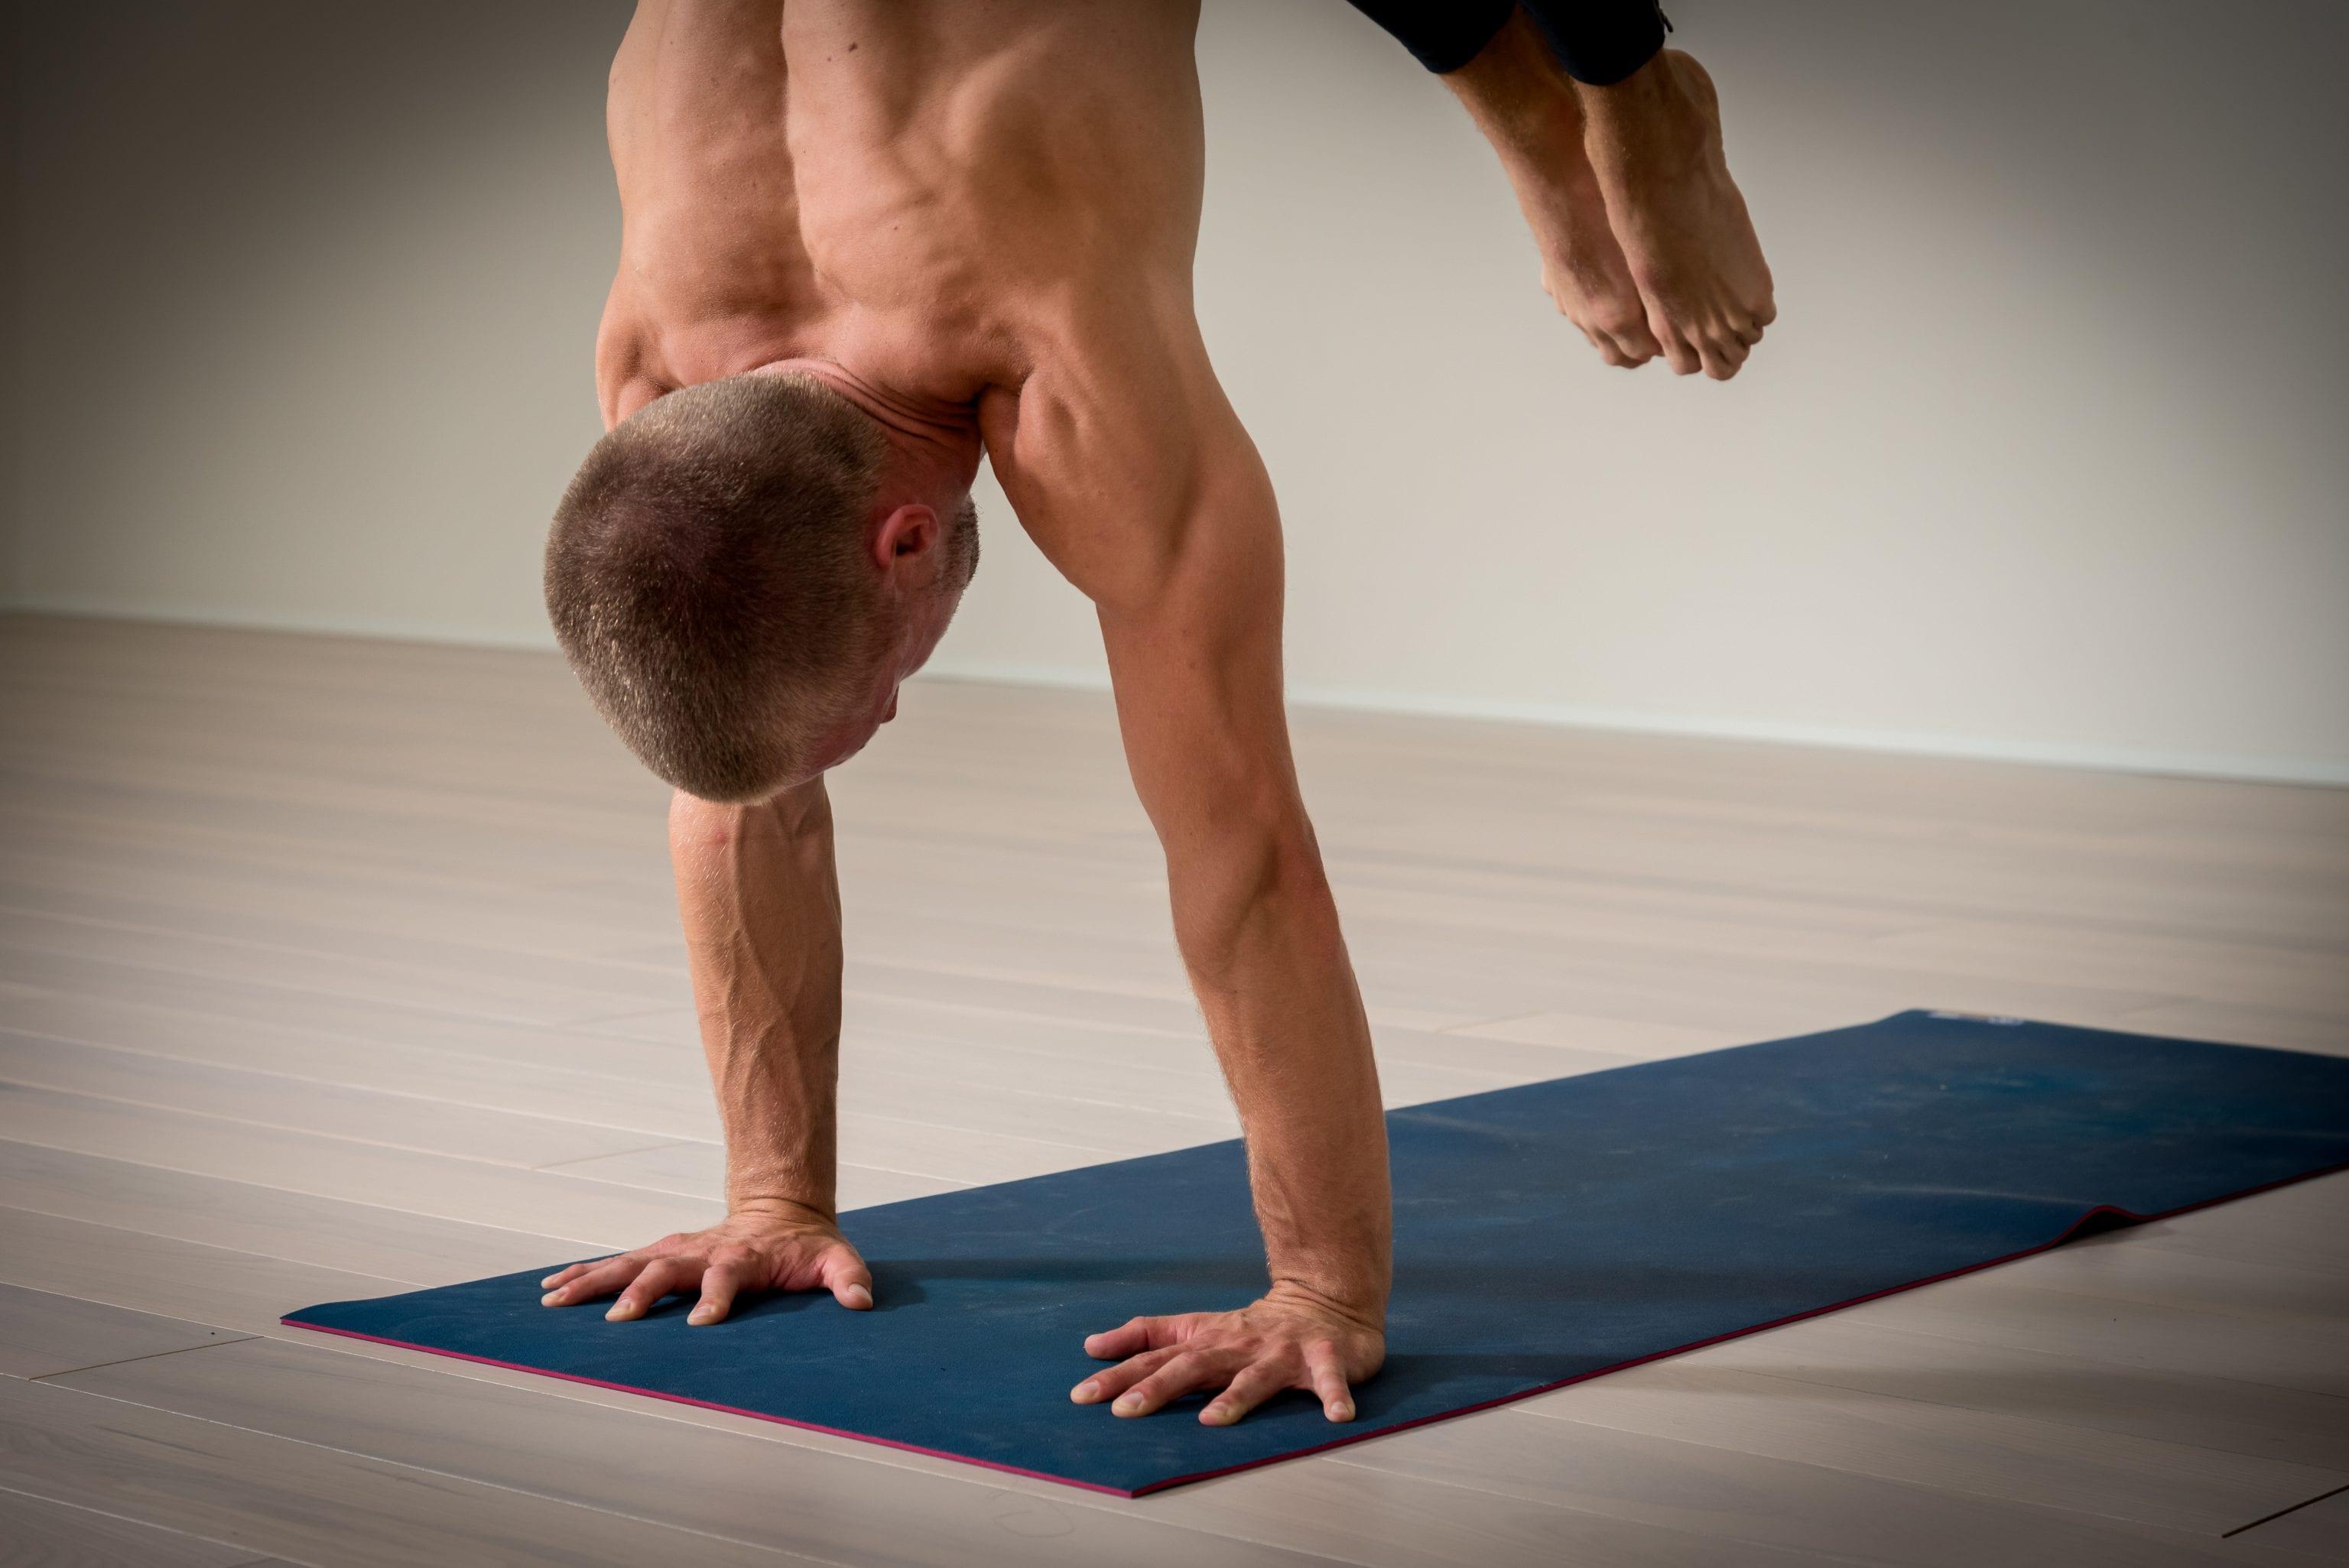 Mysore Yoga CPH - handstand - Henrik Martinsen - yoga - Ashtanga - Astanga - Copenhagen - København - Frederiksberg